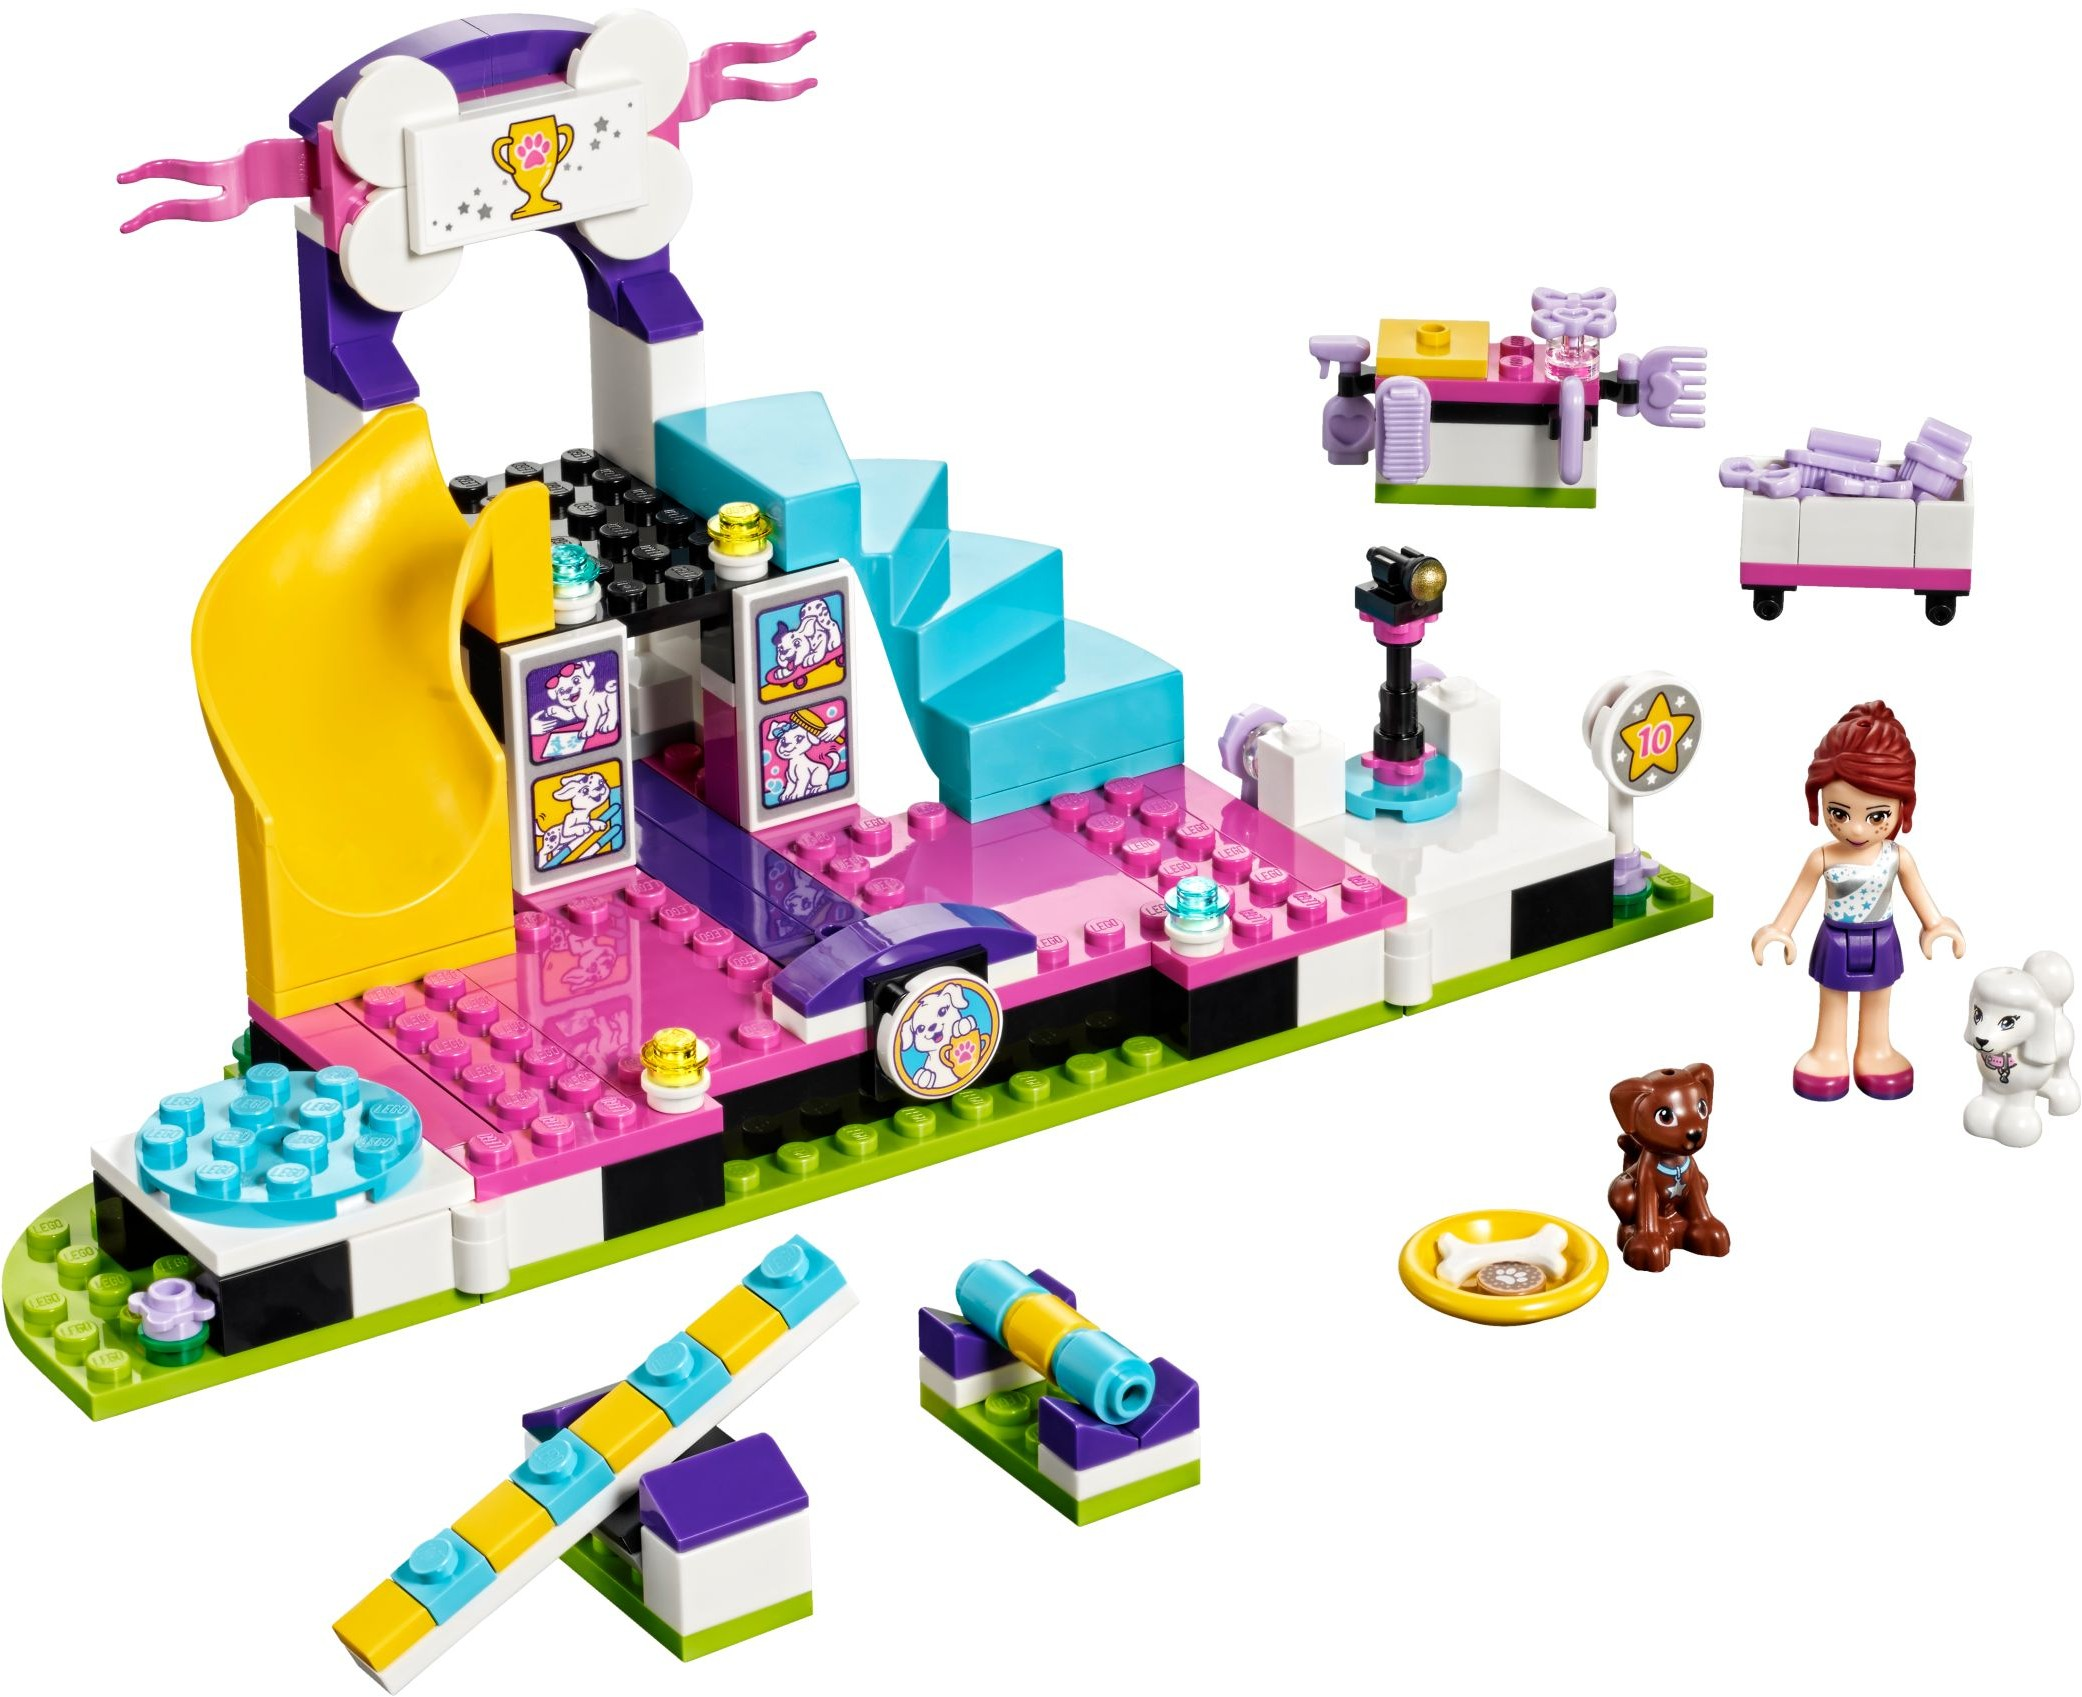 Friends 2017 Tagged Dog Brickset Lego Set Guide And Database